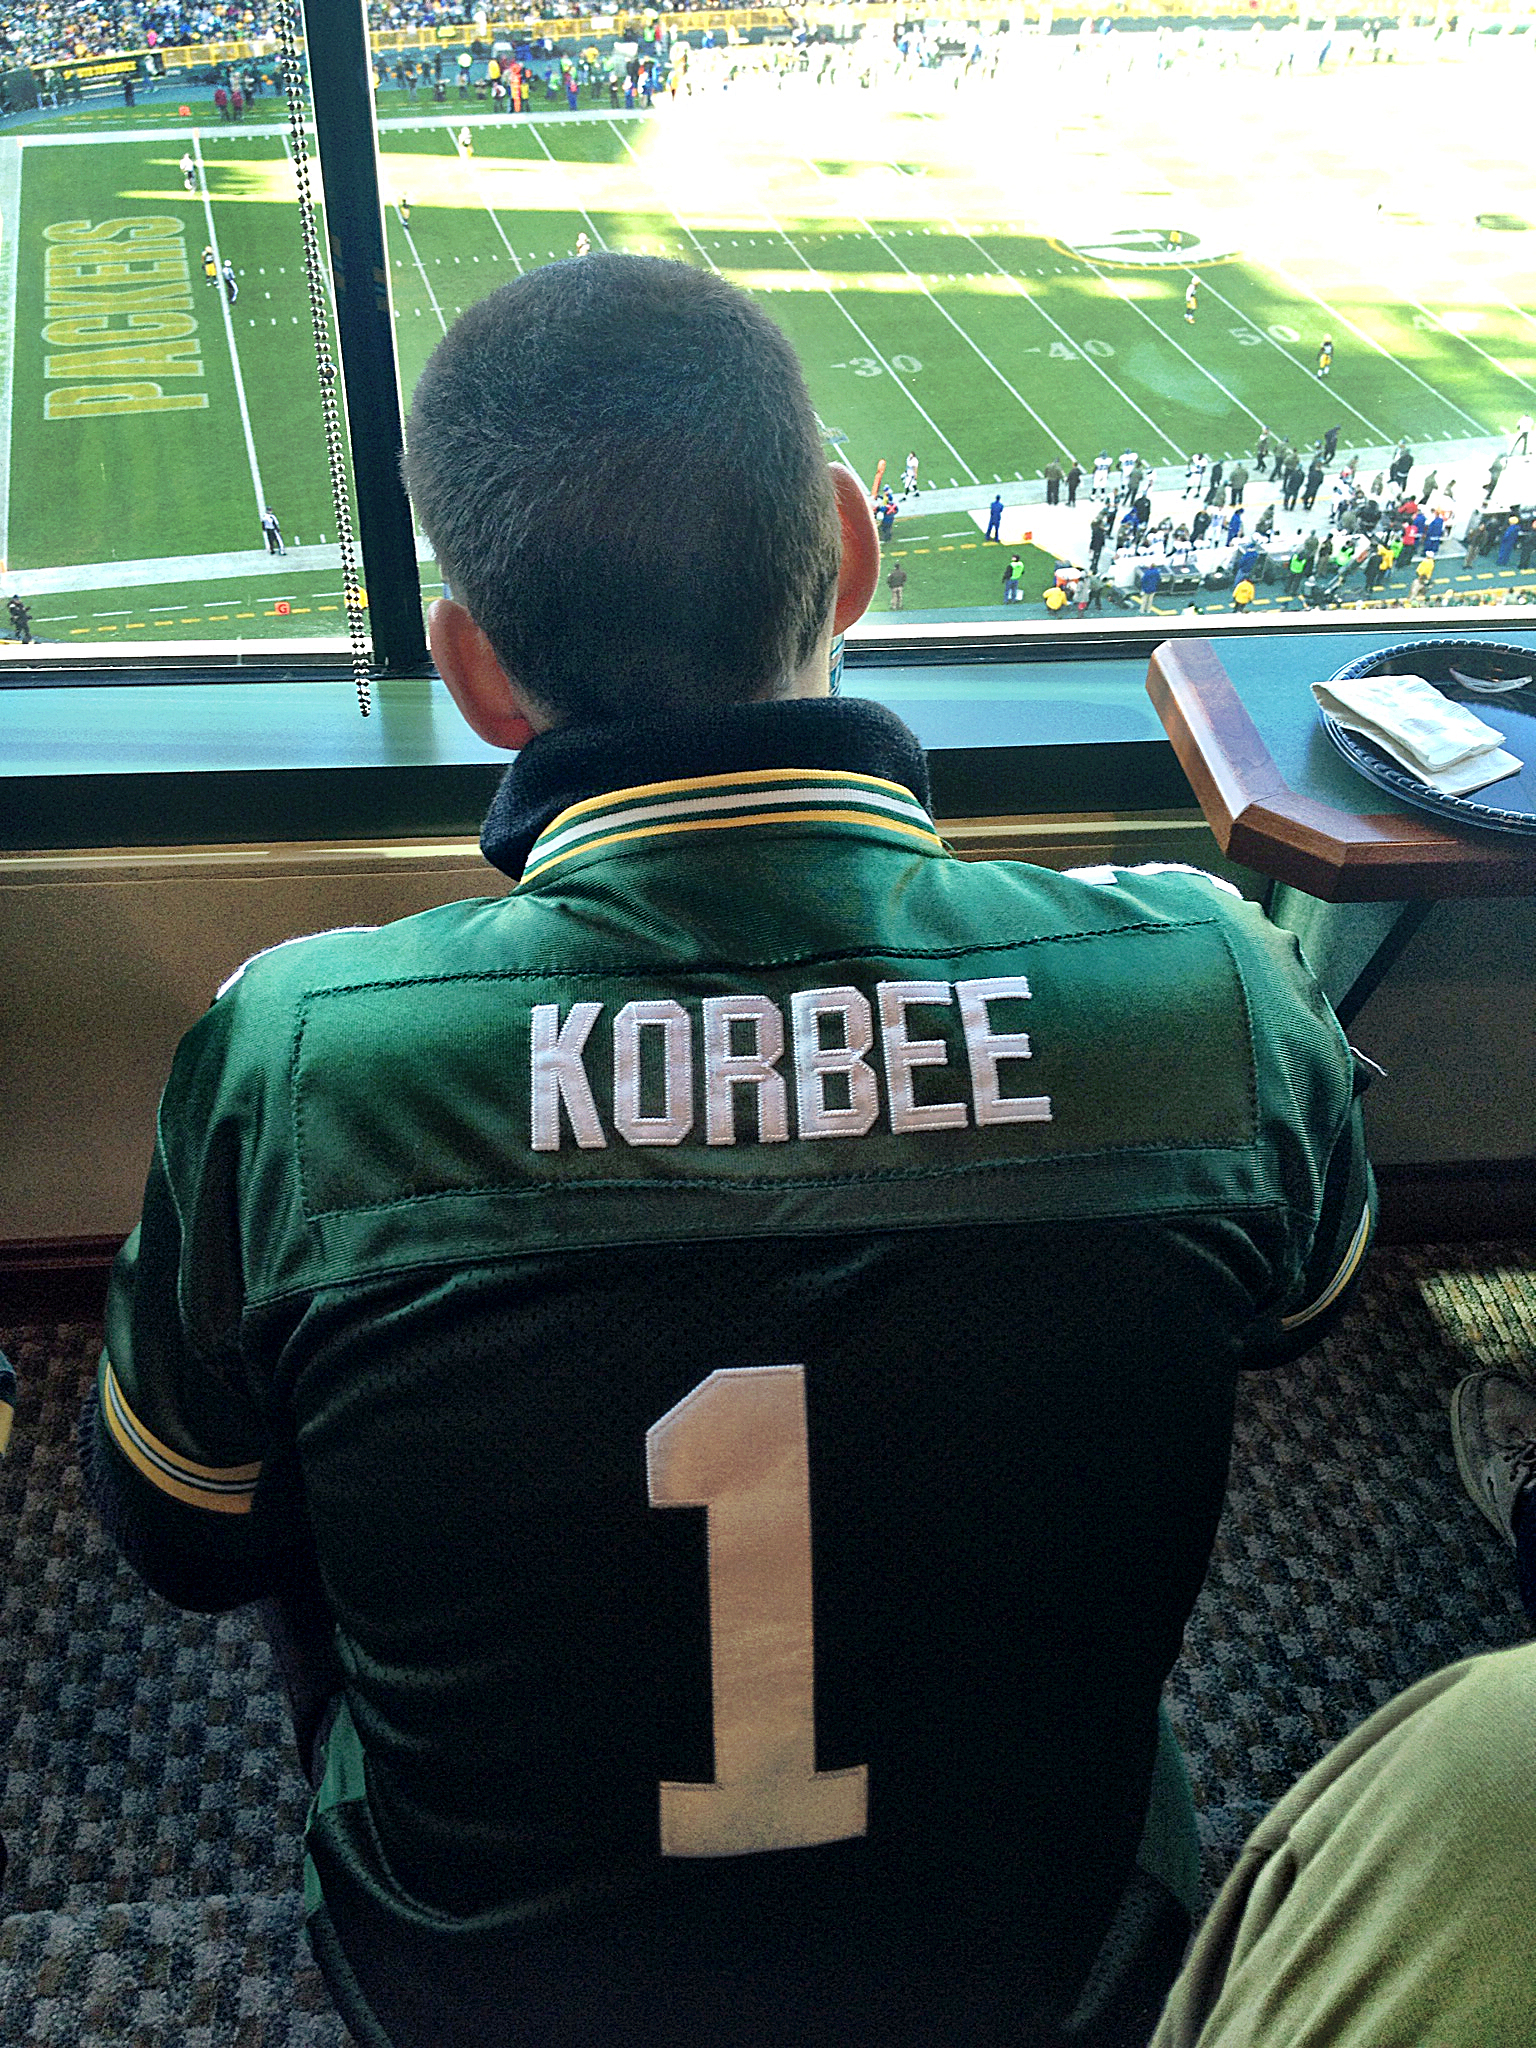 Korbee-Lambeau-Anthem-31.jpg